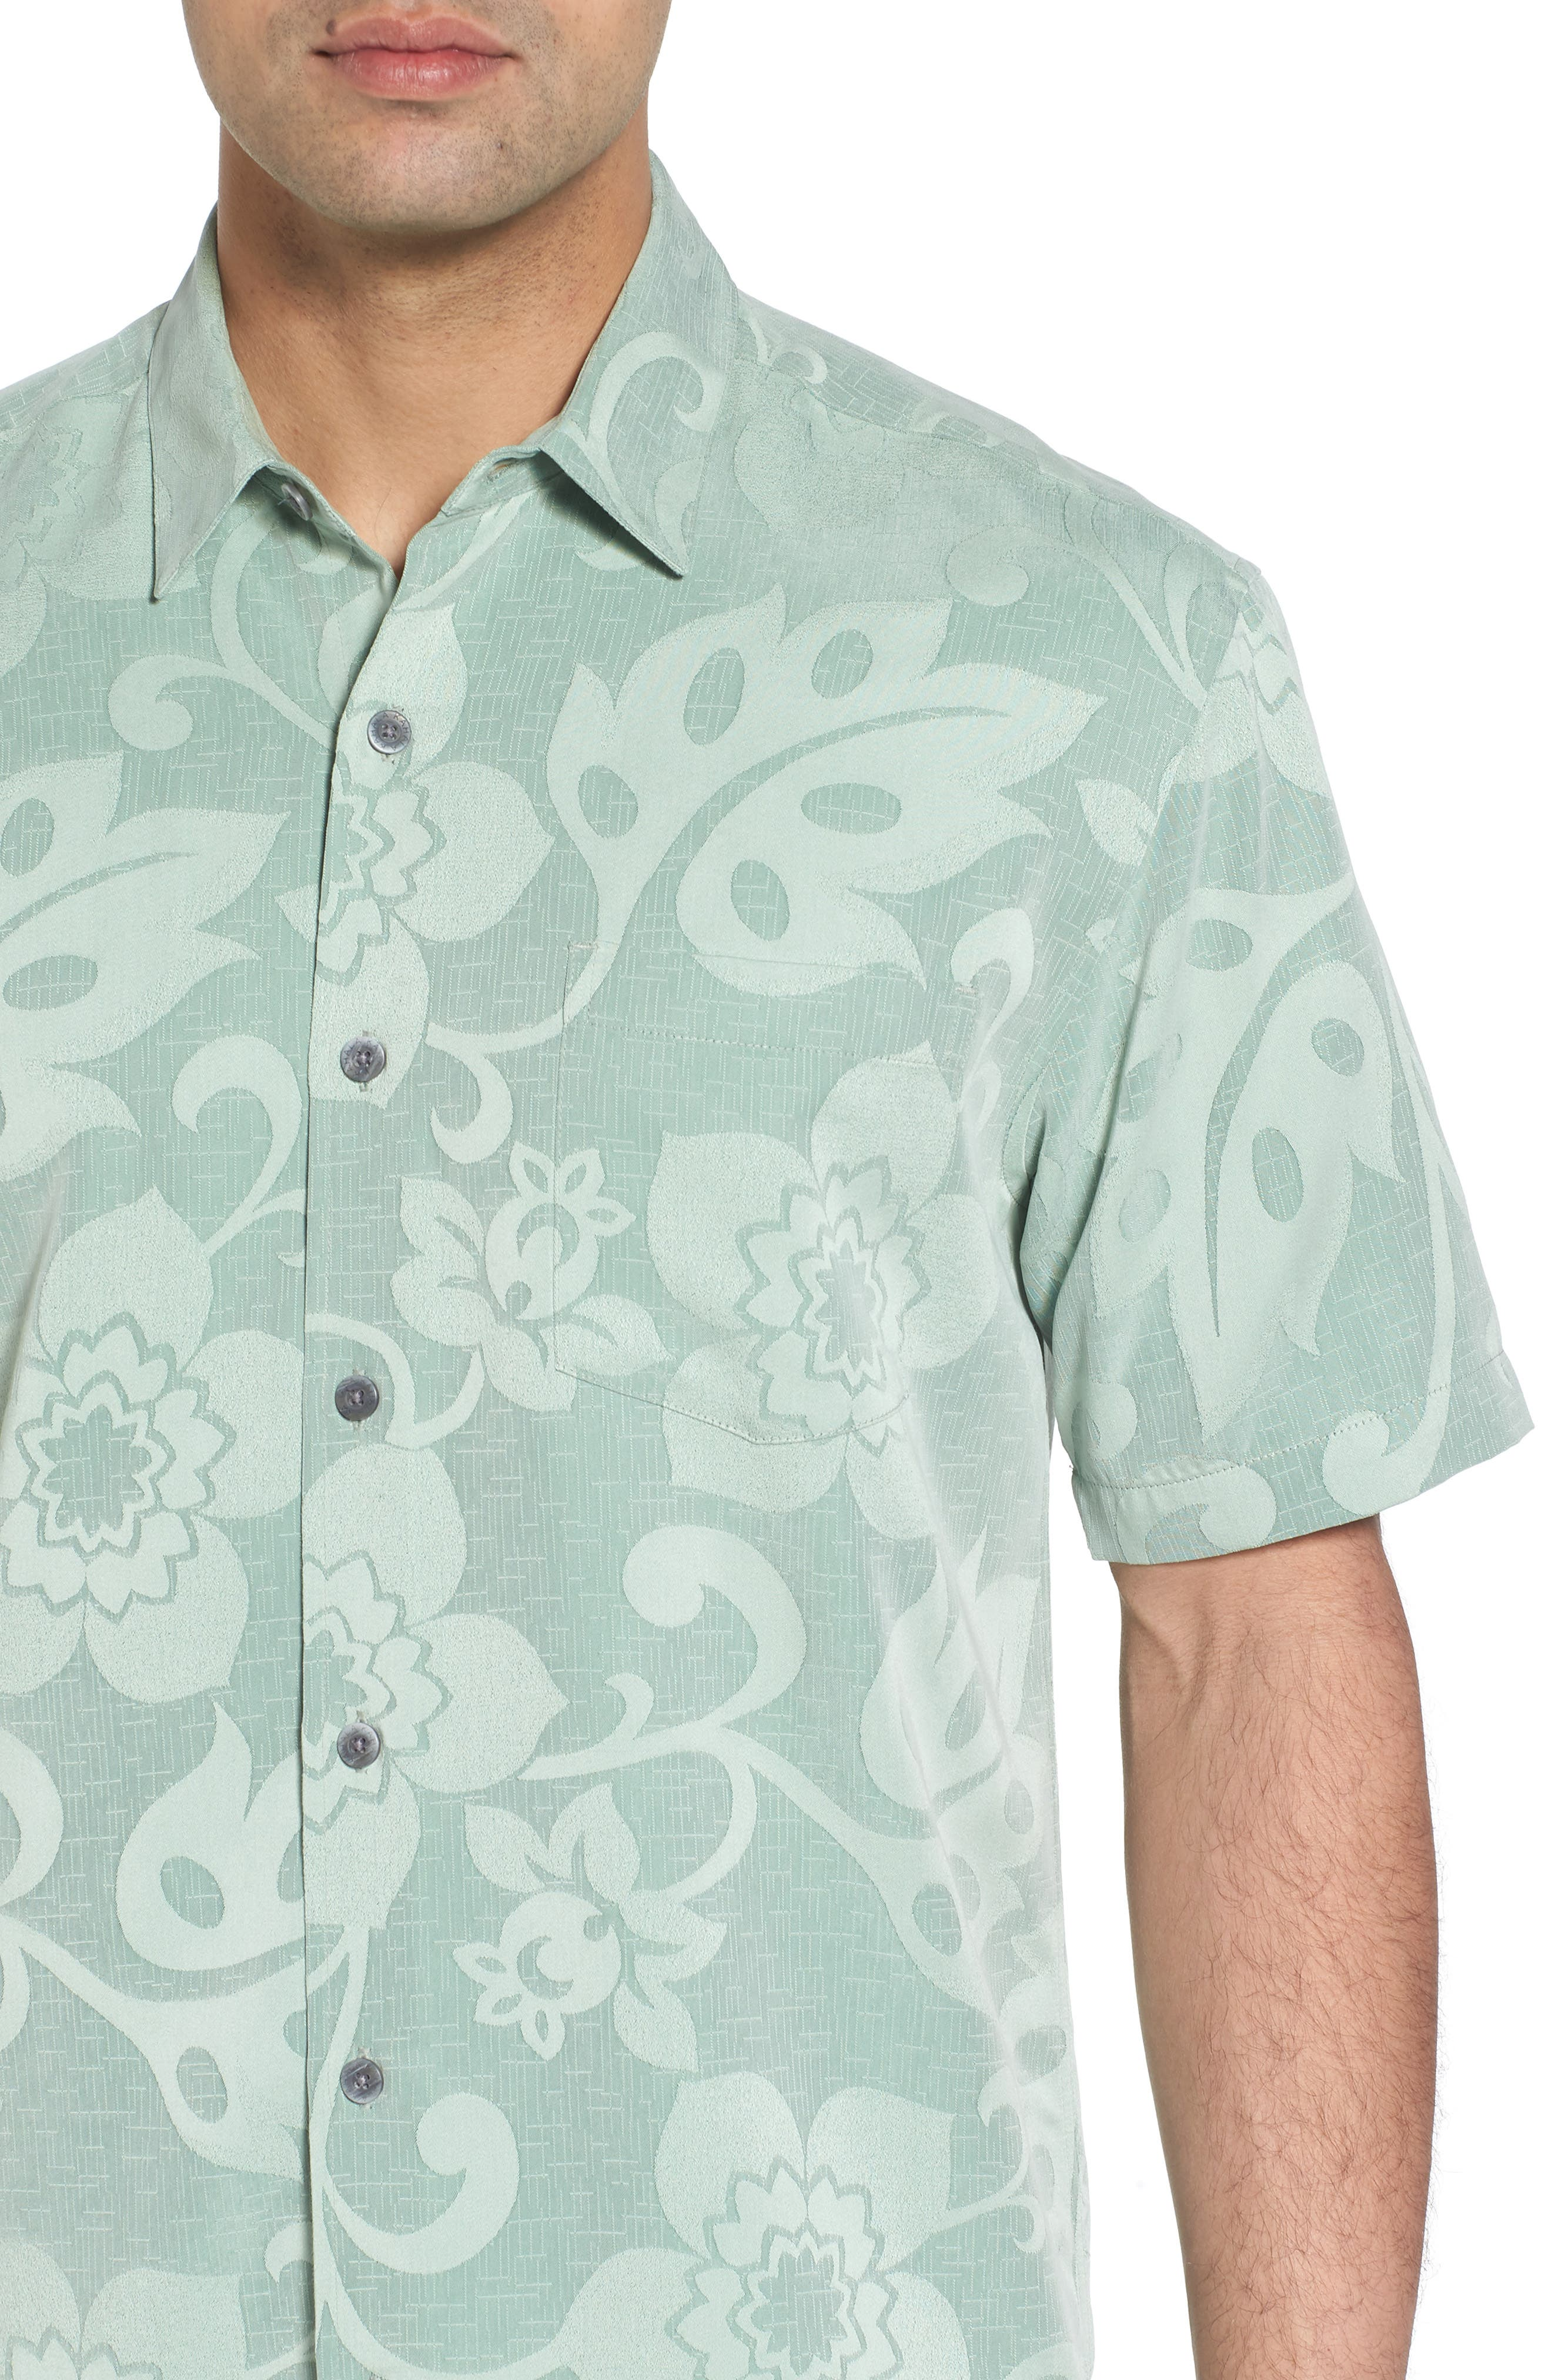 Kalawai Relaxed Fit Camp Shirt,                             Alternate thumbnail 4, color,                             Green